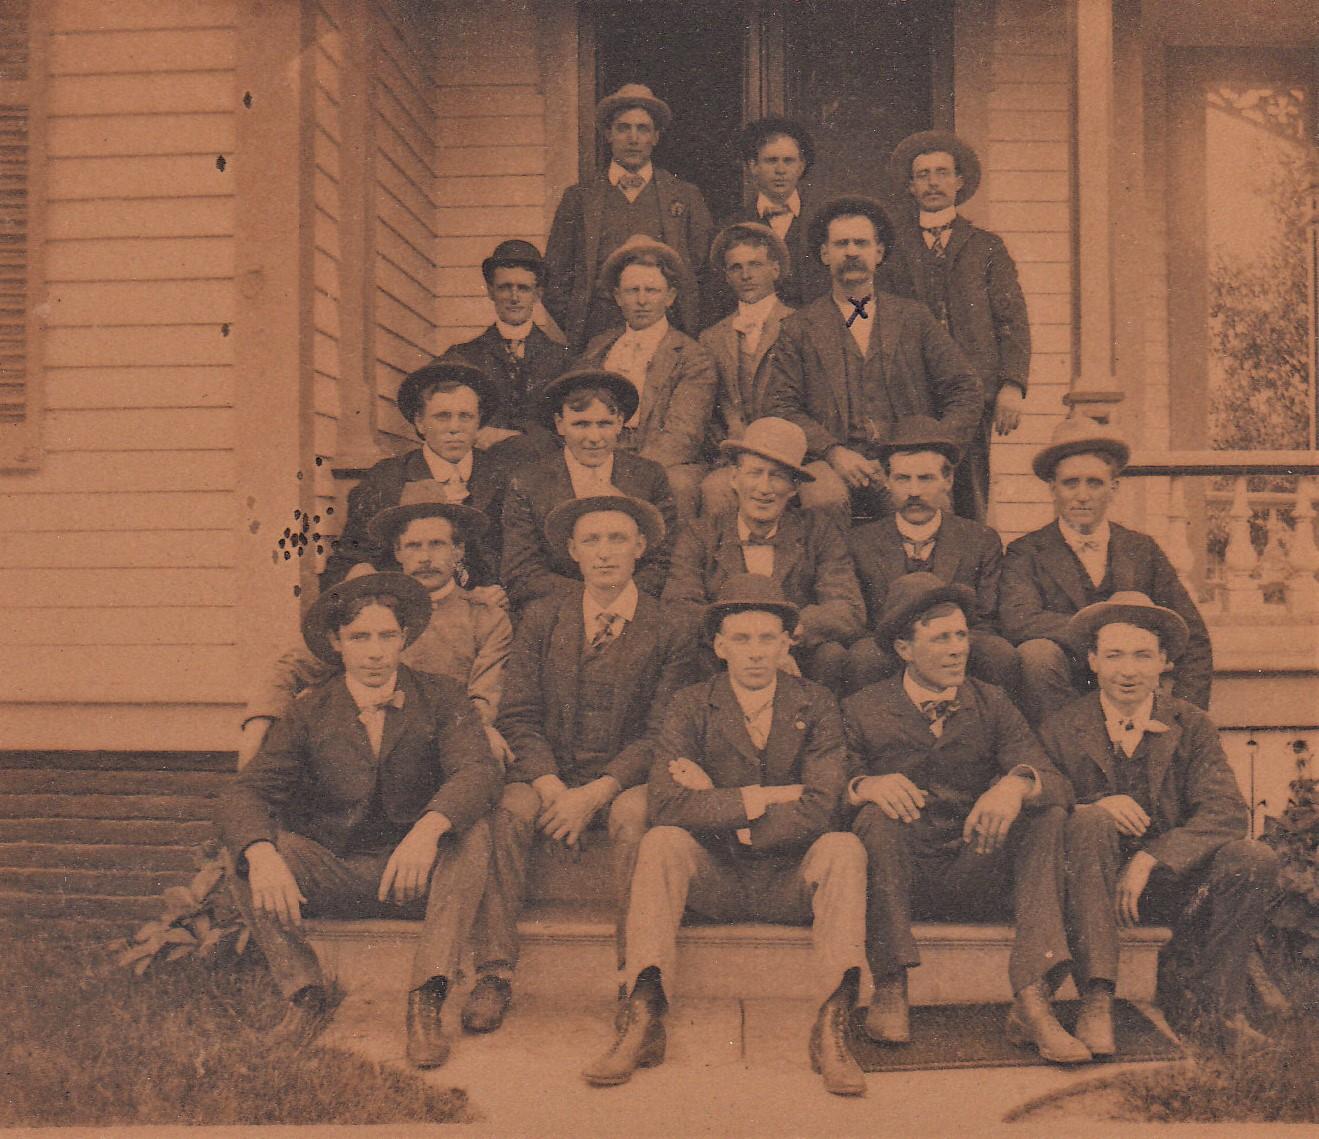 Creston Volunteer Firemen about 1879/